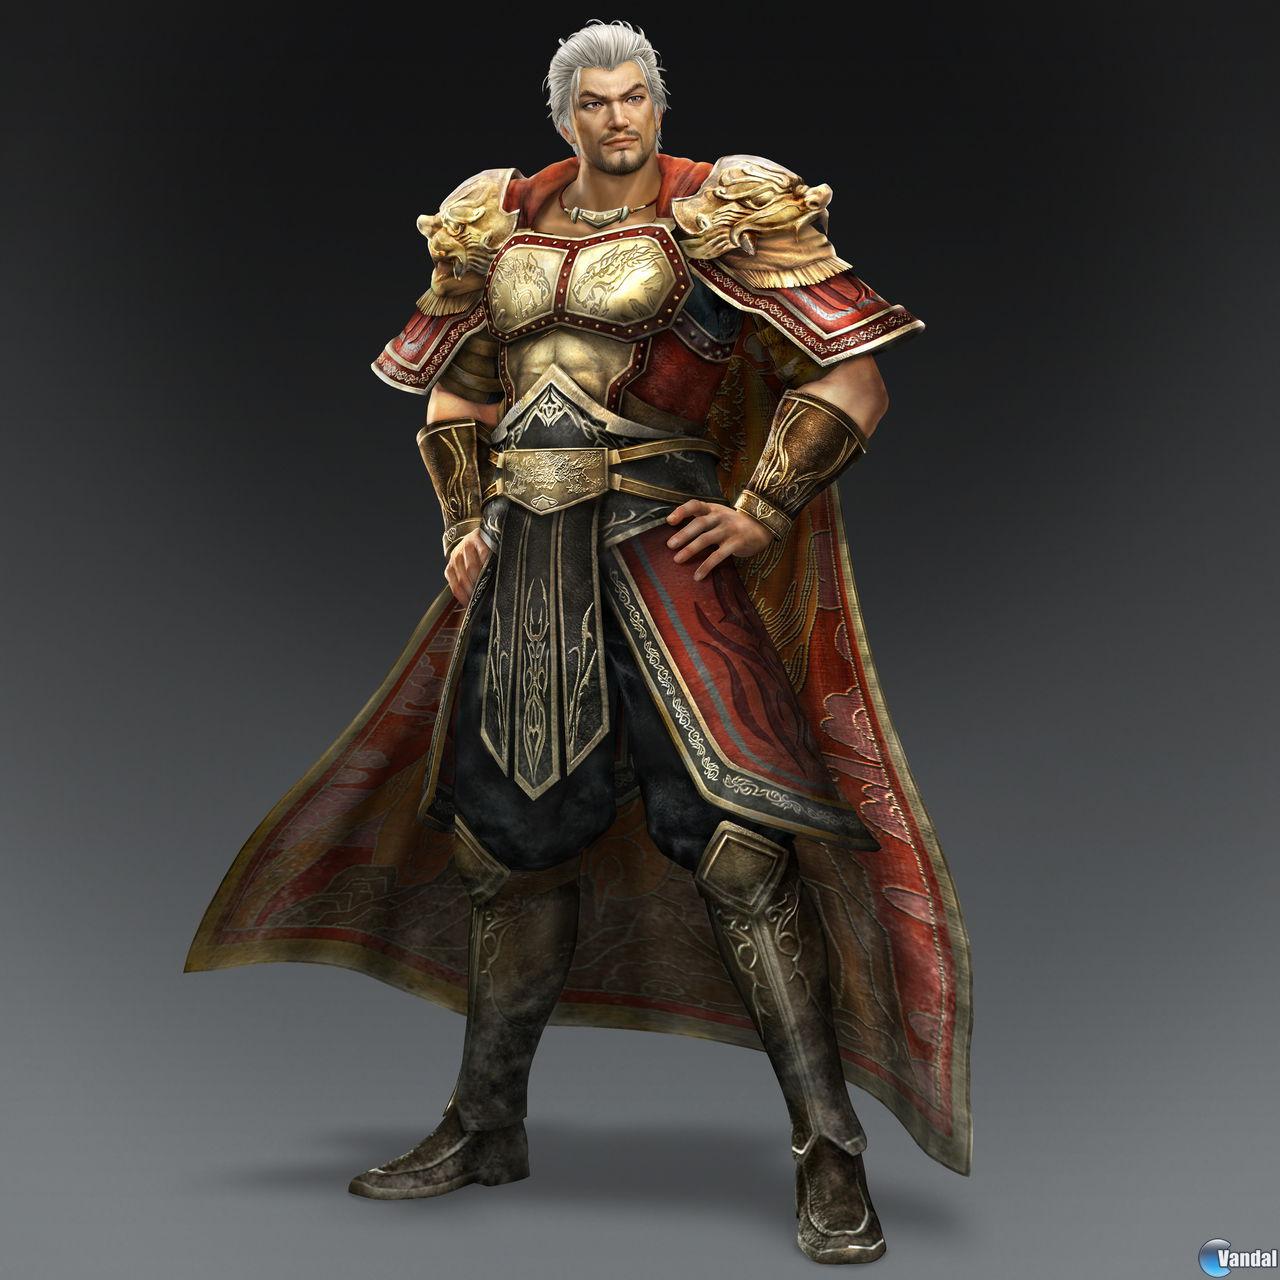 Warriors Orochi 3 Lian Shi: Personajes De Dynasty Warriors 8.